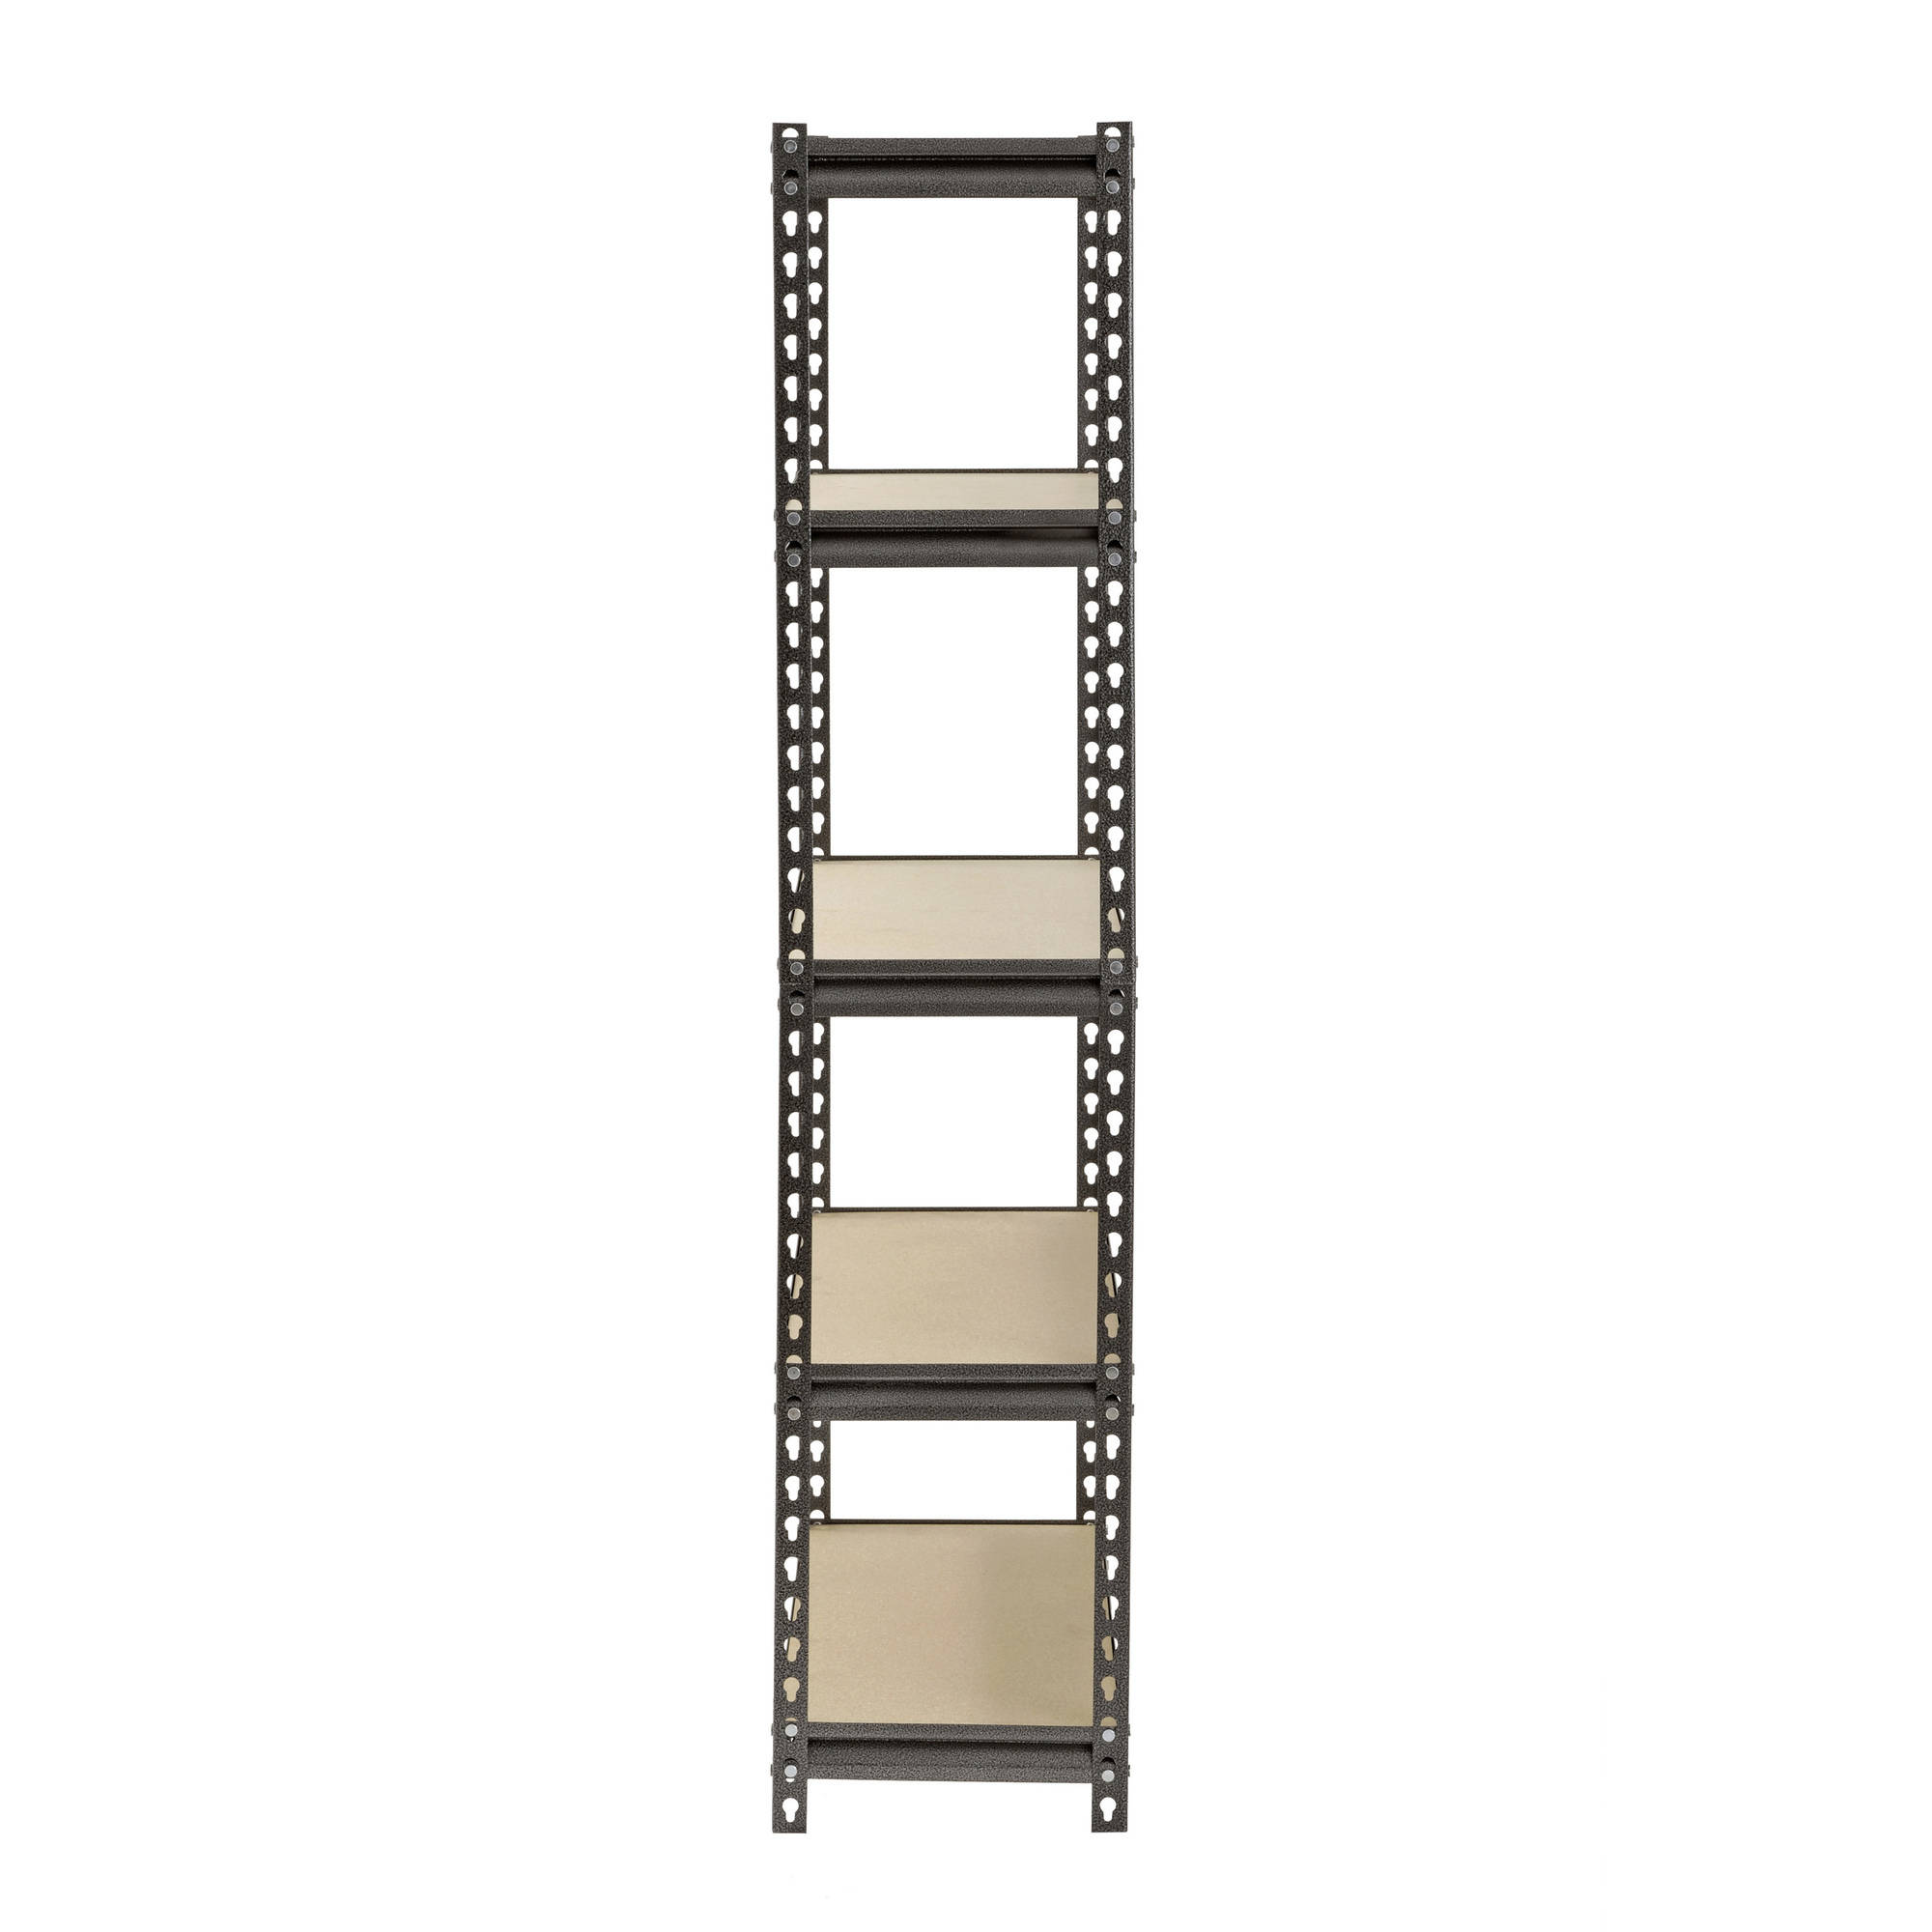 muscle rack silver vein 12 d x 30 w x 60 h 5 shelves steel shelving unit